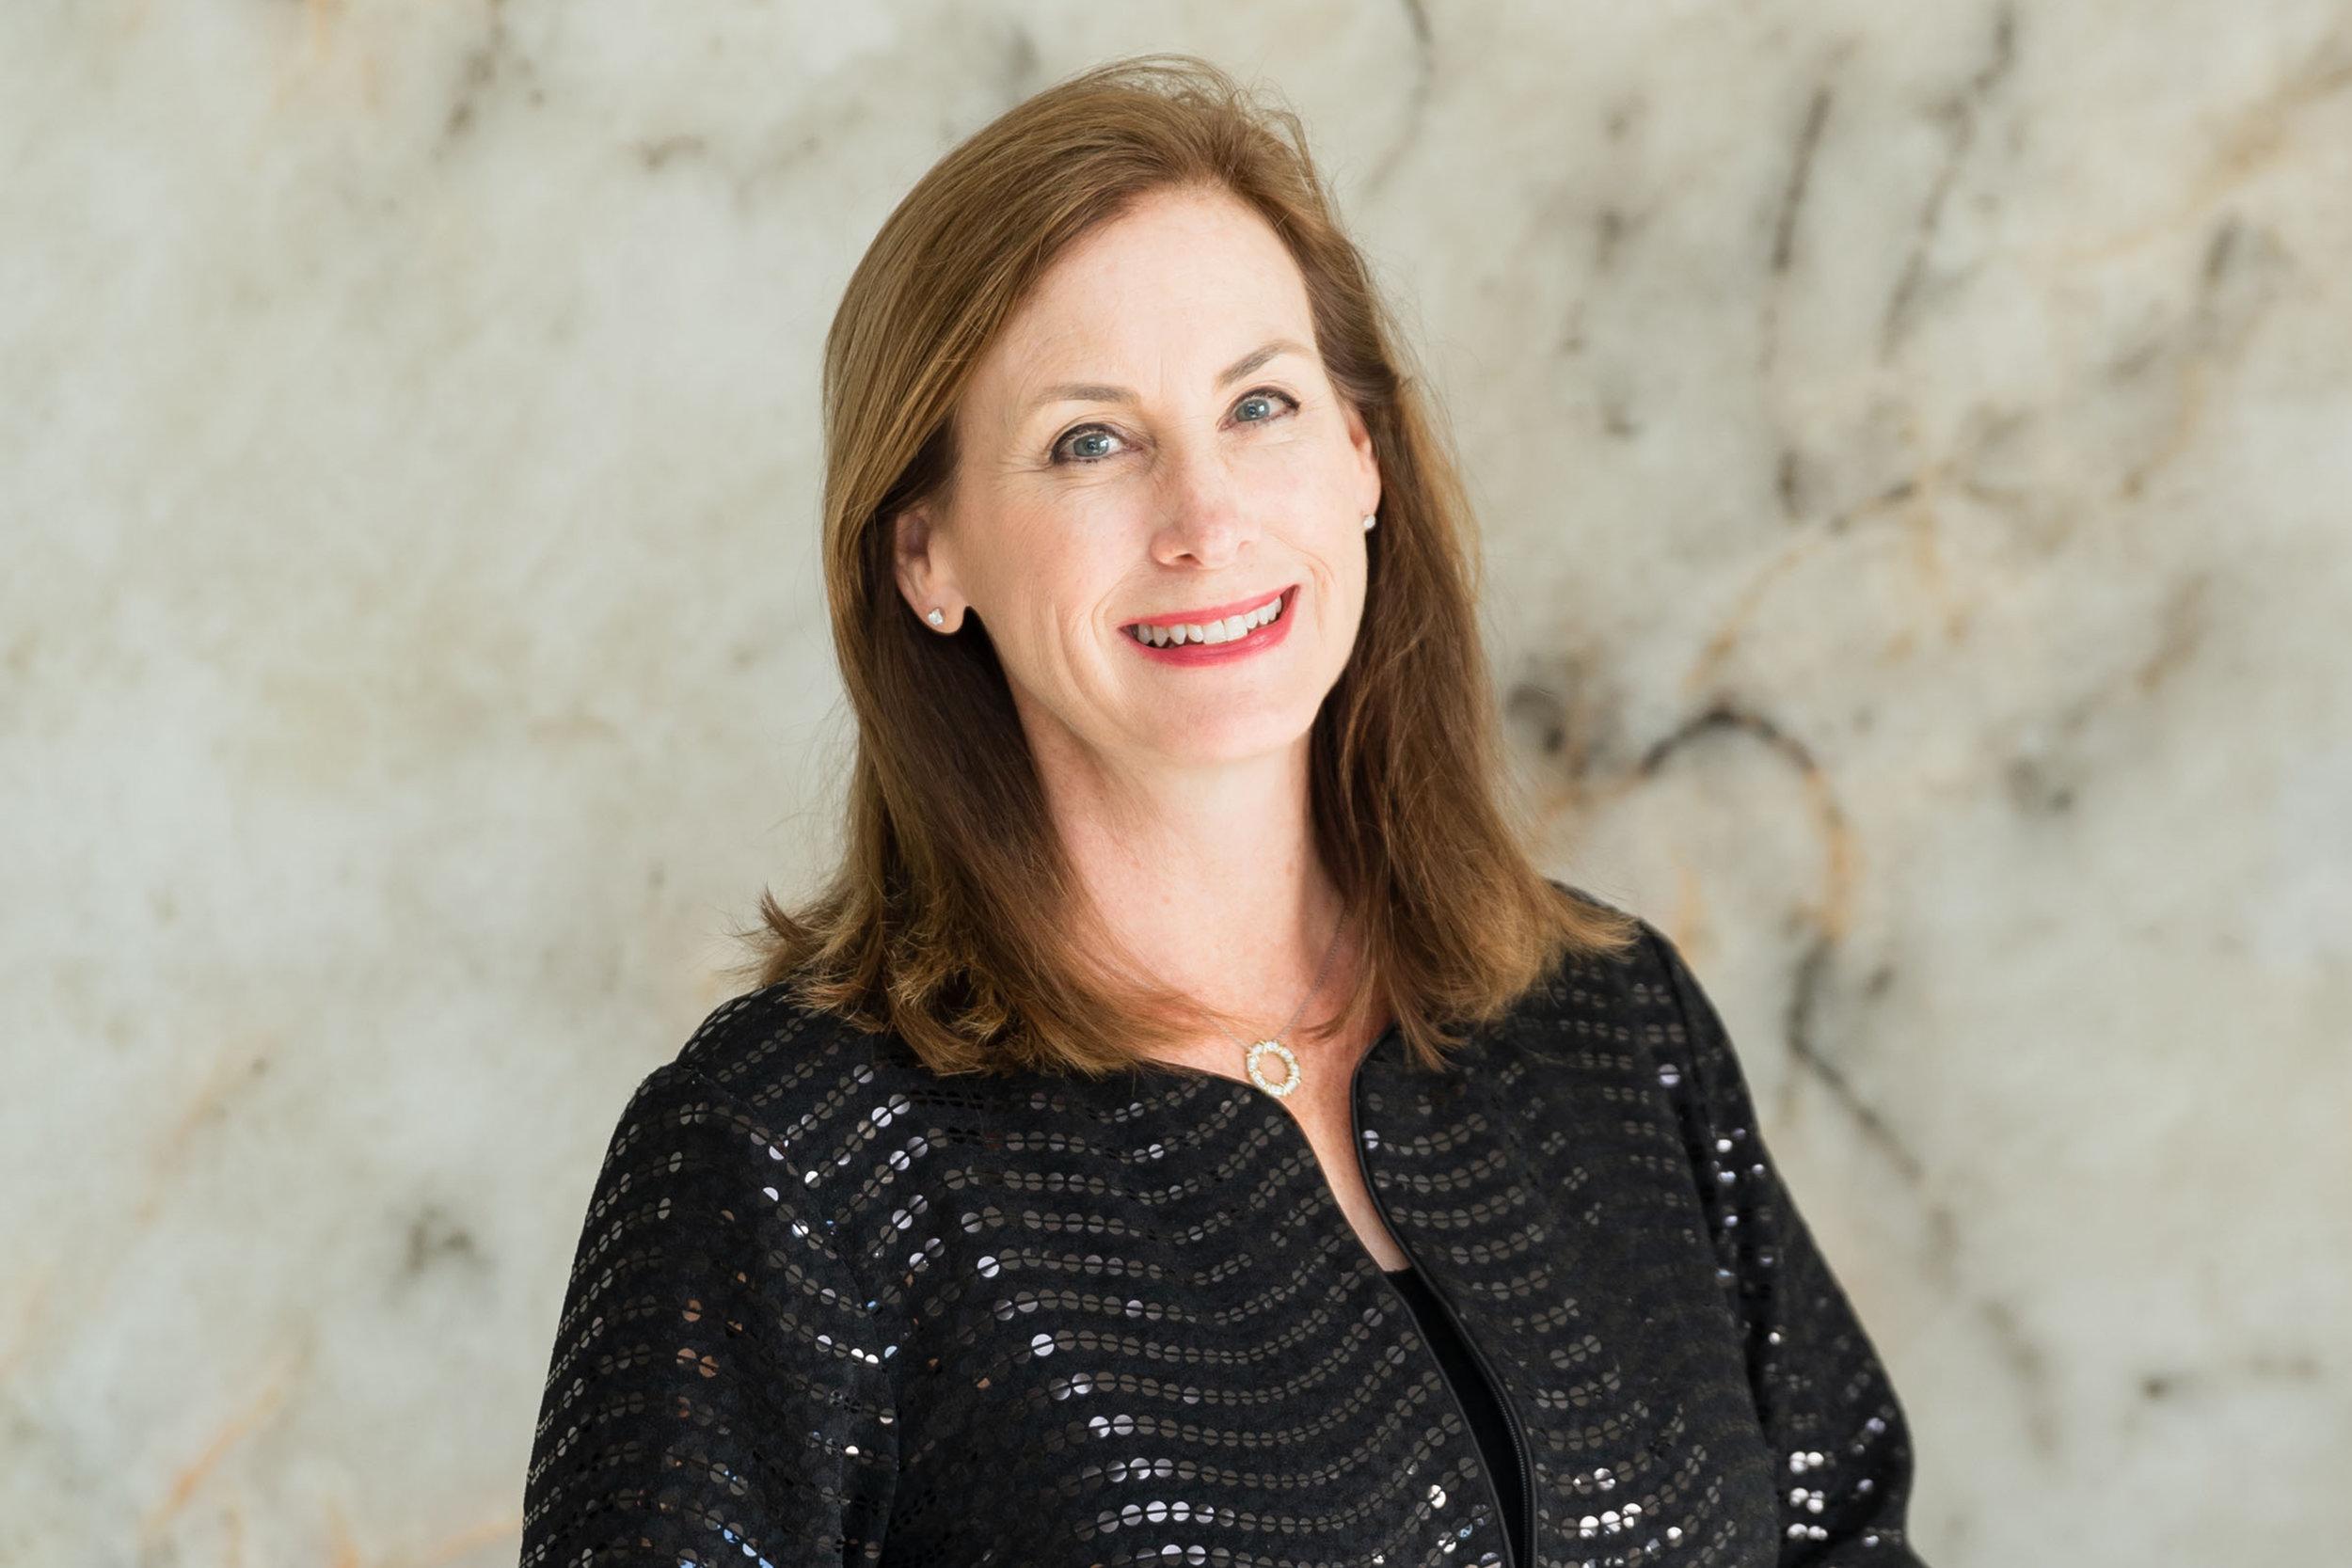 Elizabeth Connell, Esq, DM<br><em> Attorney, Founder & President, Sand Hill Insurance Services</em>